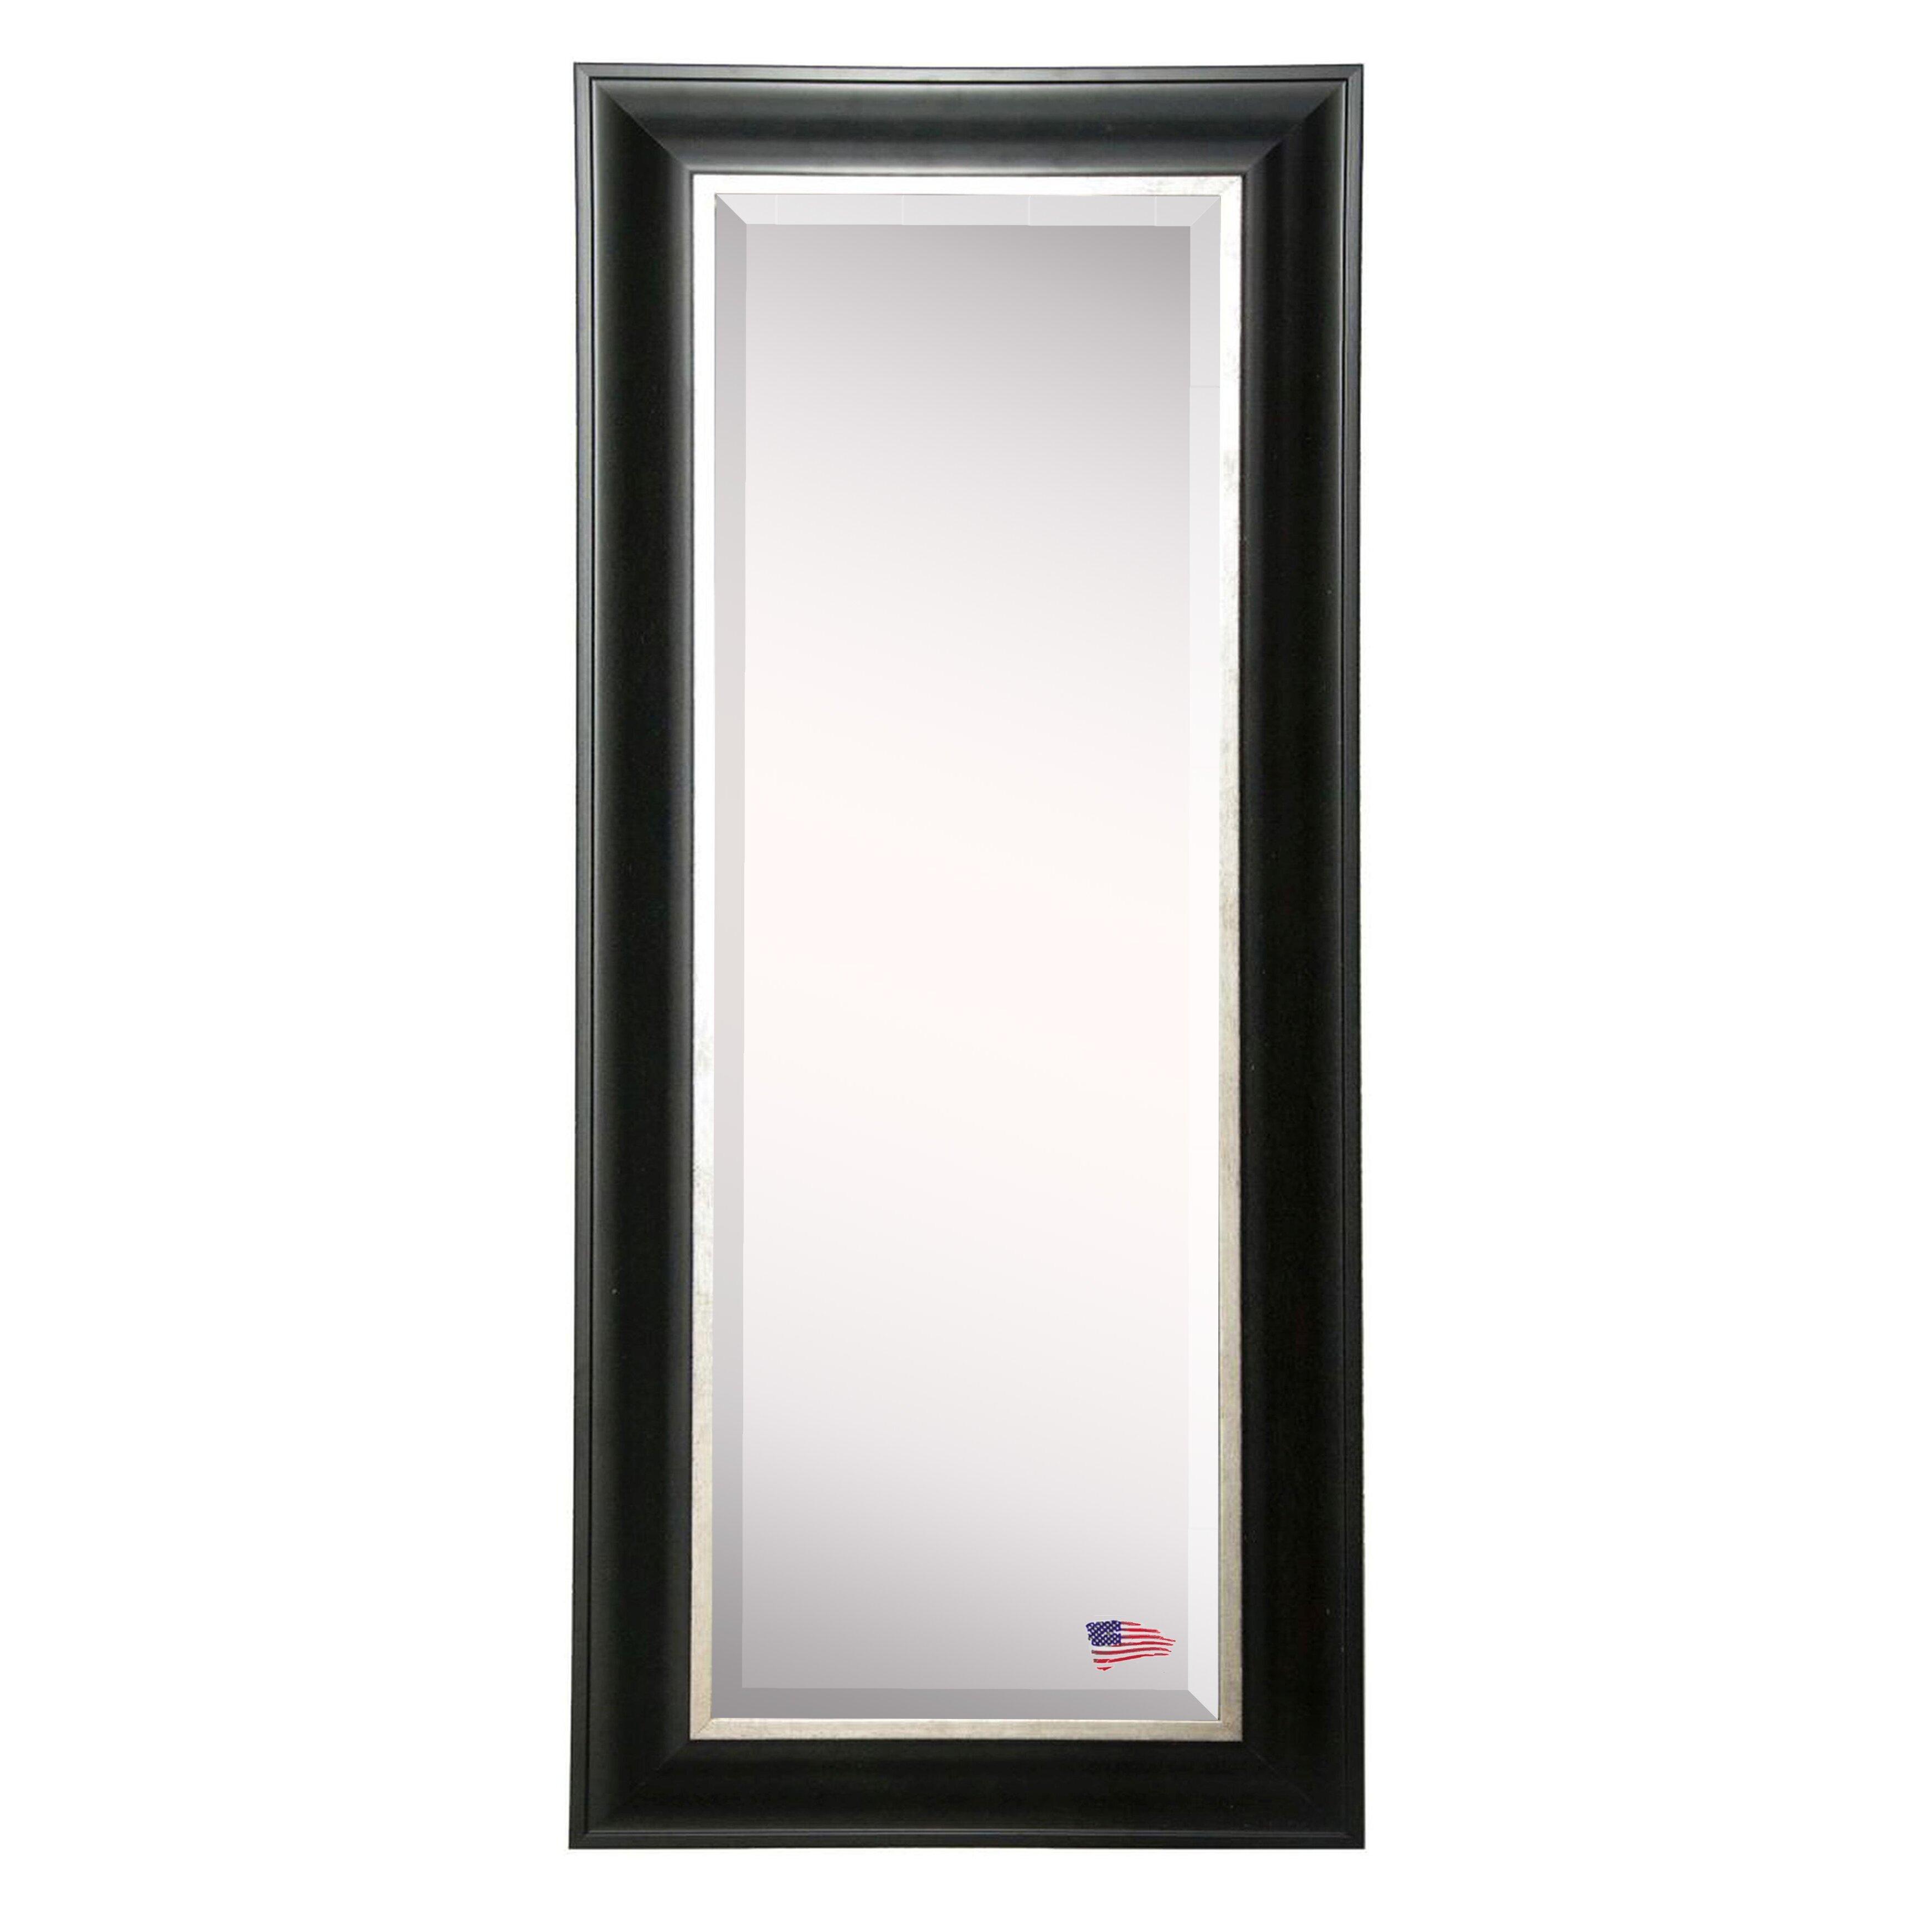 Rayne mirrors jovie jane full body beveled wall mirror for Full wall mirrors